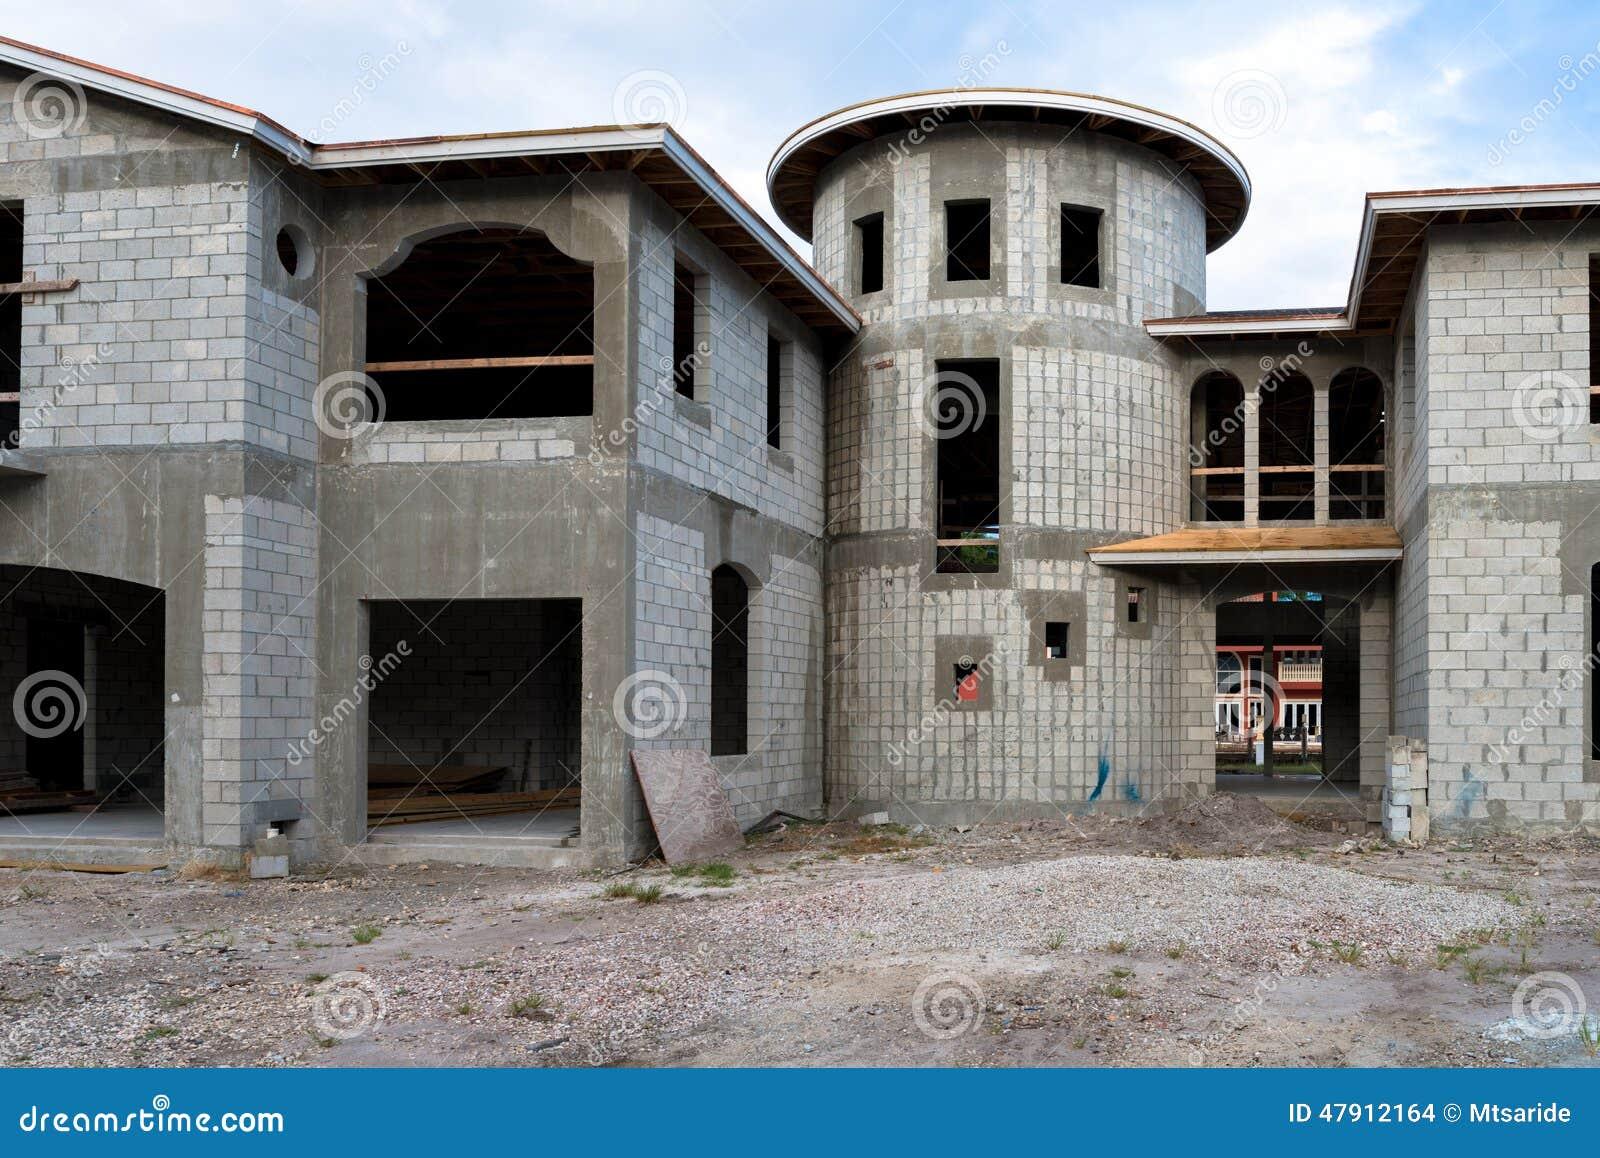 Concrete house under construction the for Cinder block home construction